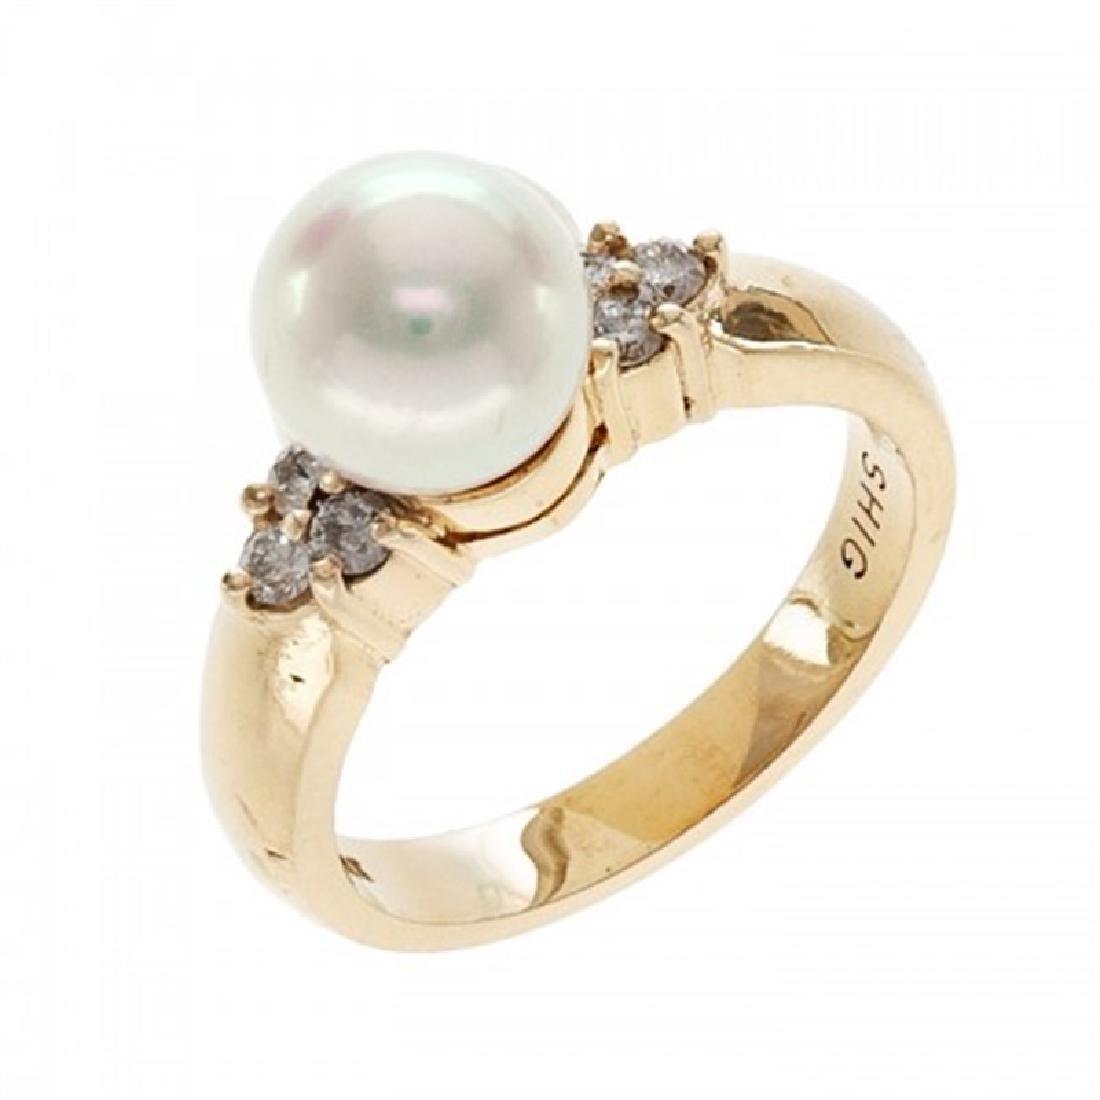 8.0-8.5mm Japanese Akoya Pearl Ring with Diamonds